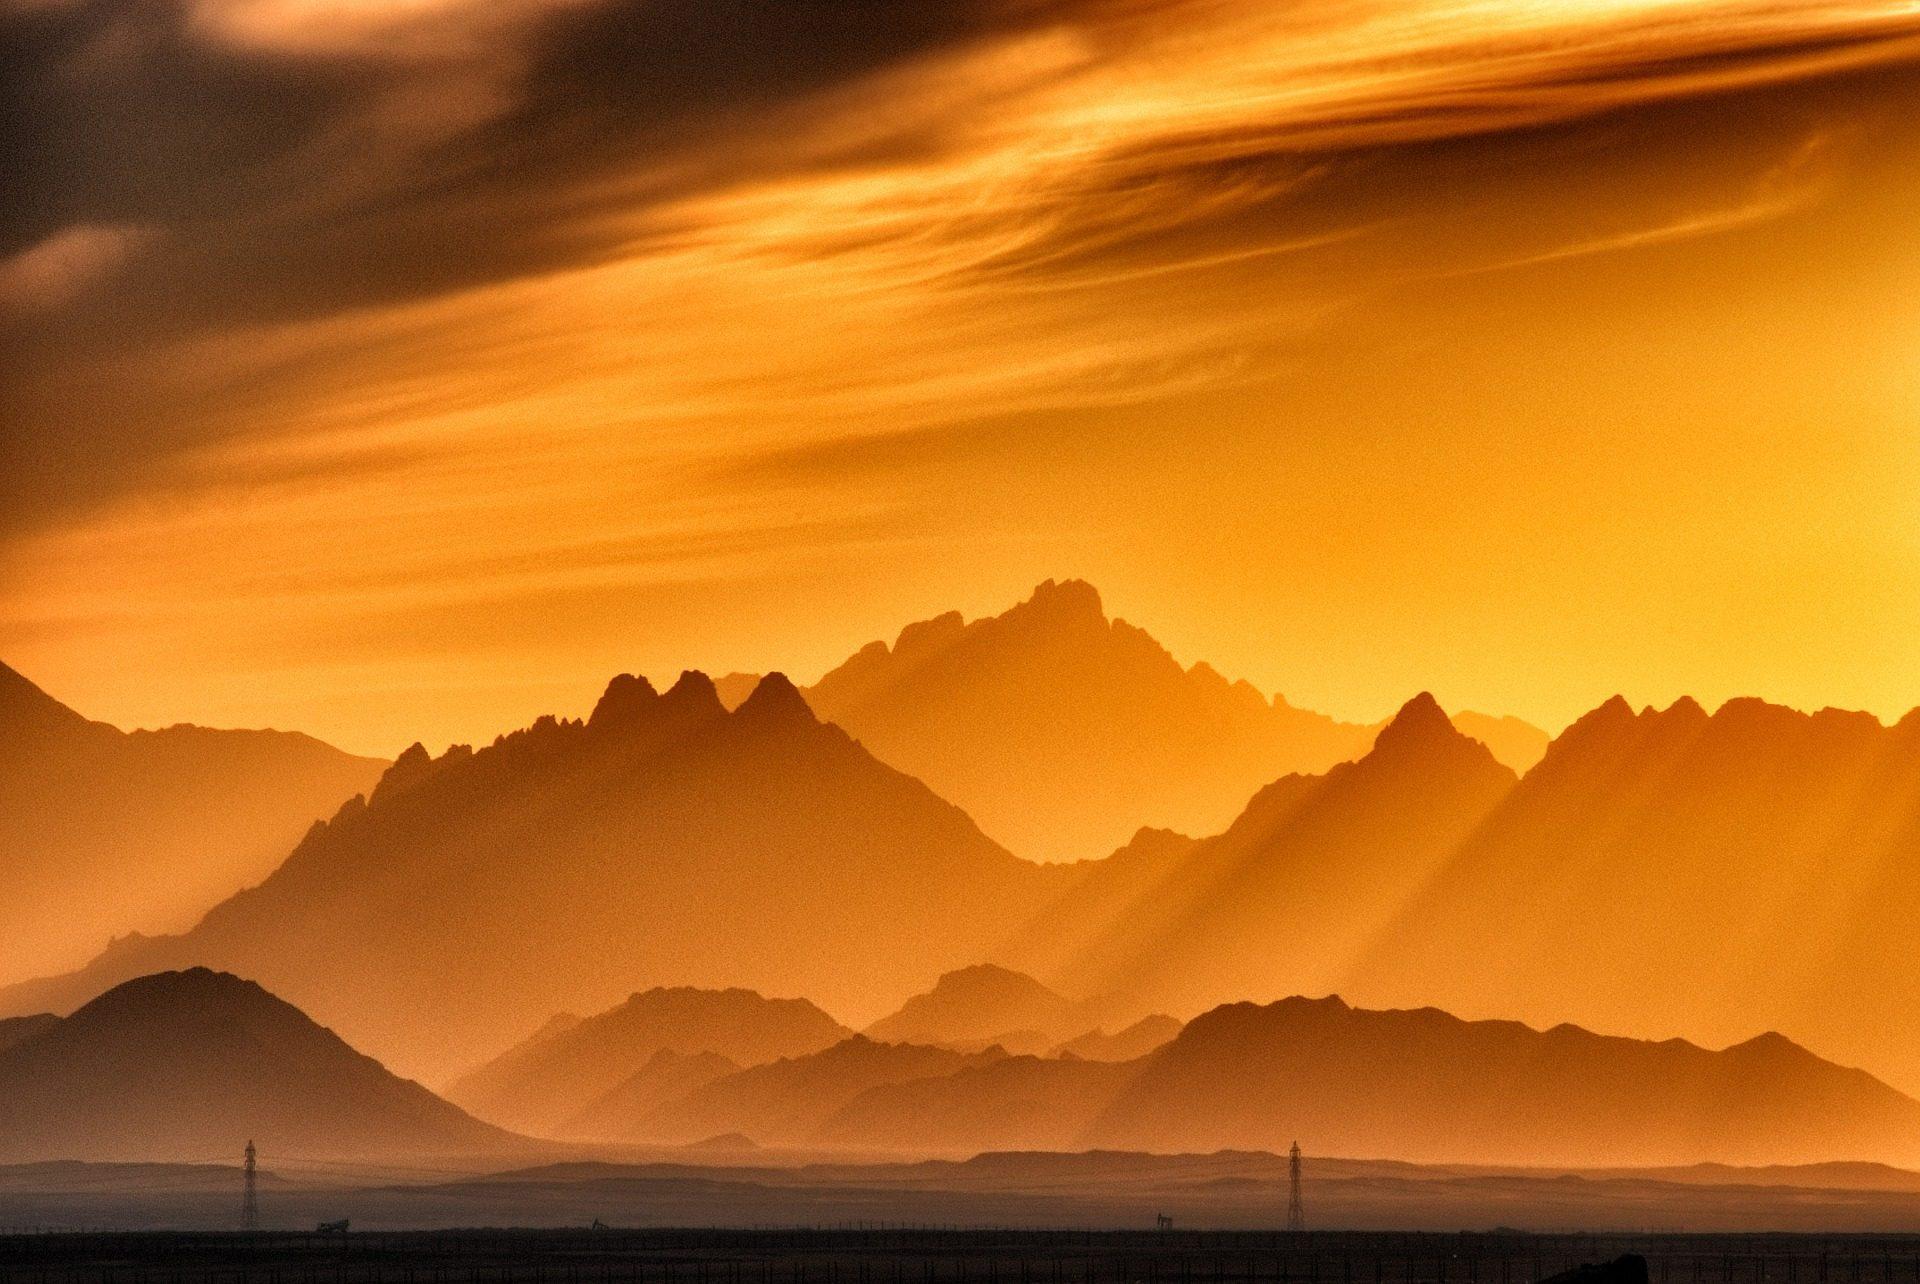 montañas, Raios, luz, nuvens, Sol, halos, Pôr do sol - Papéis de parede HD - Professor-falken.com